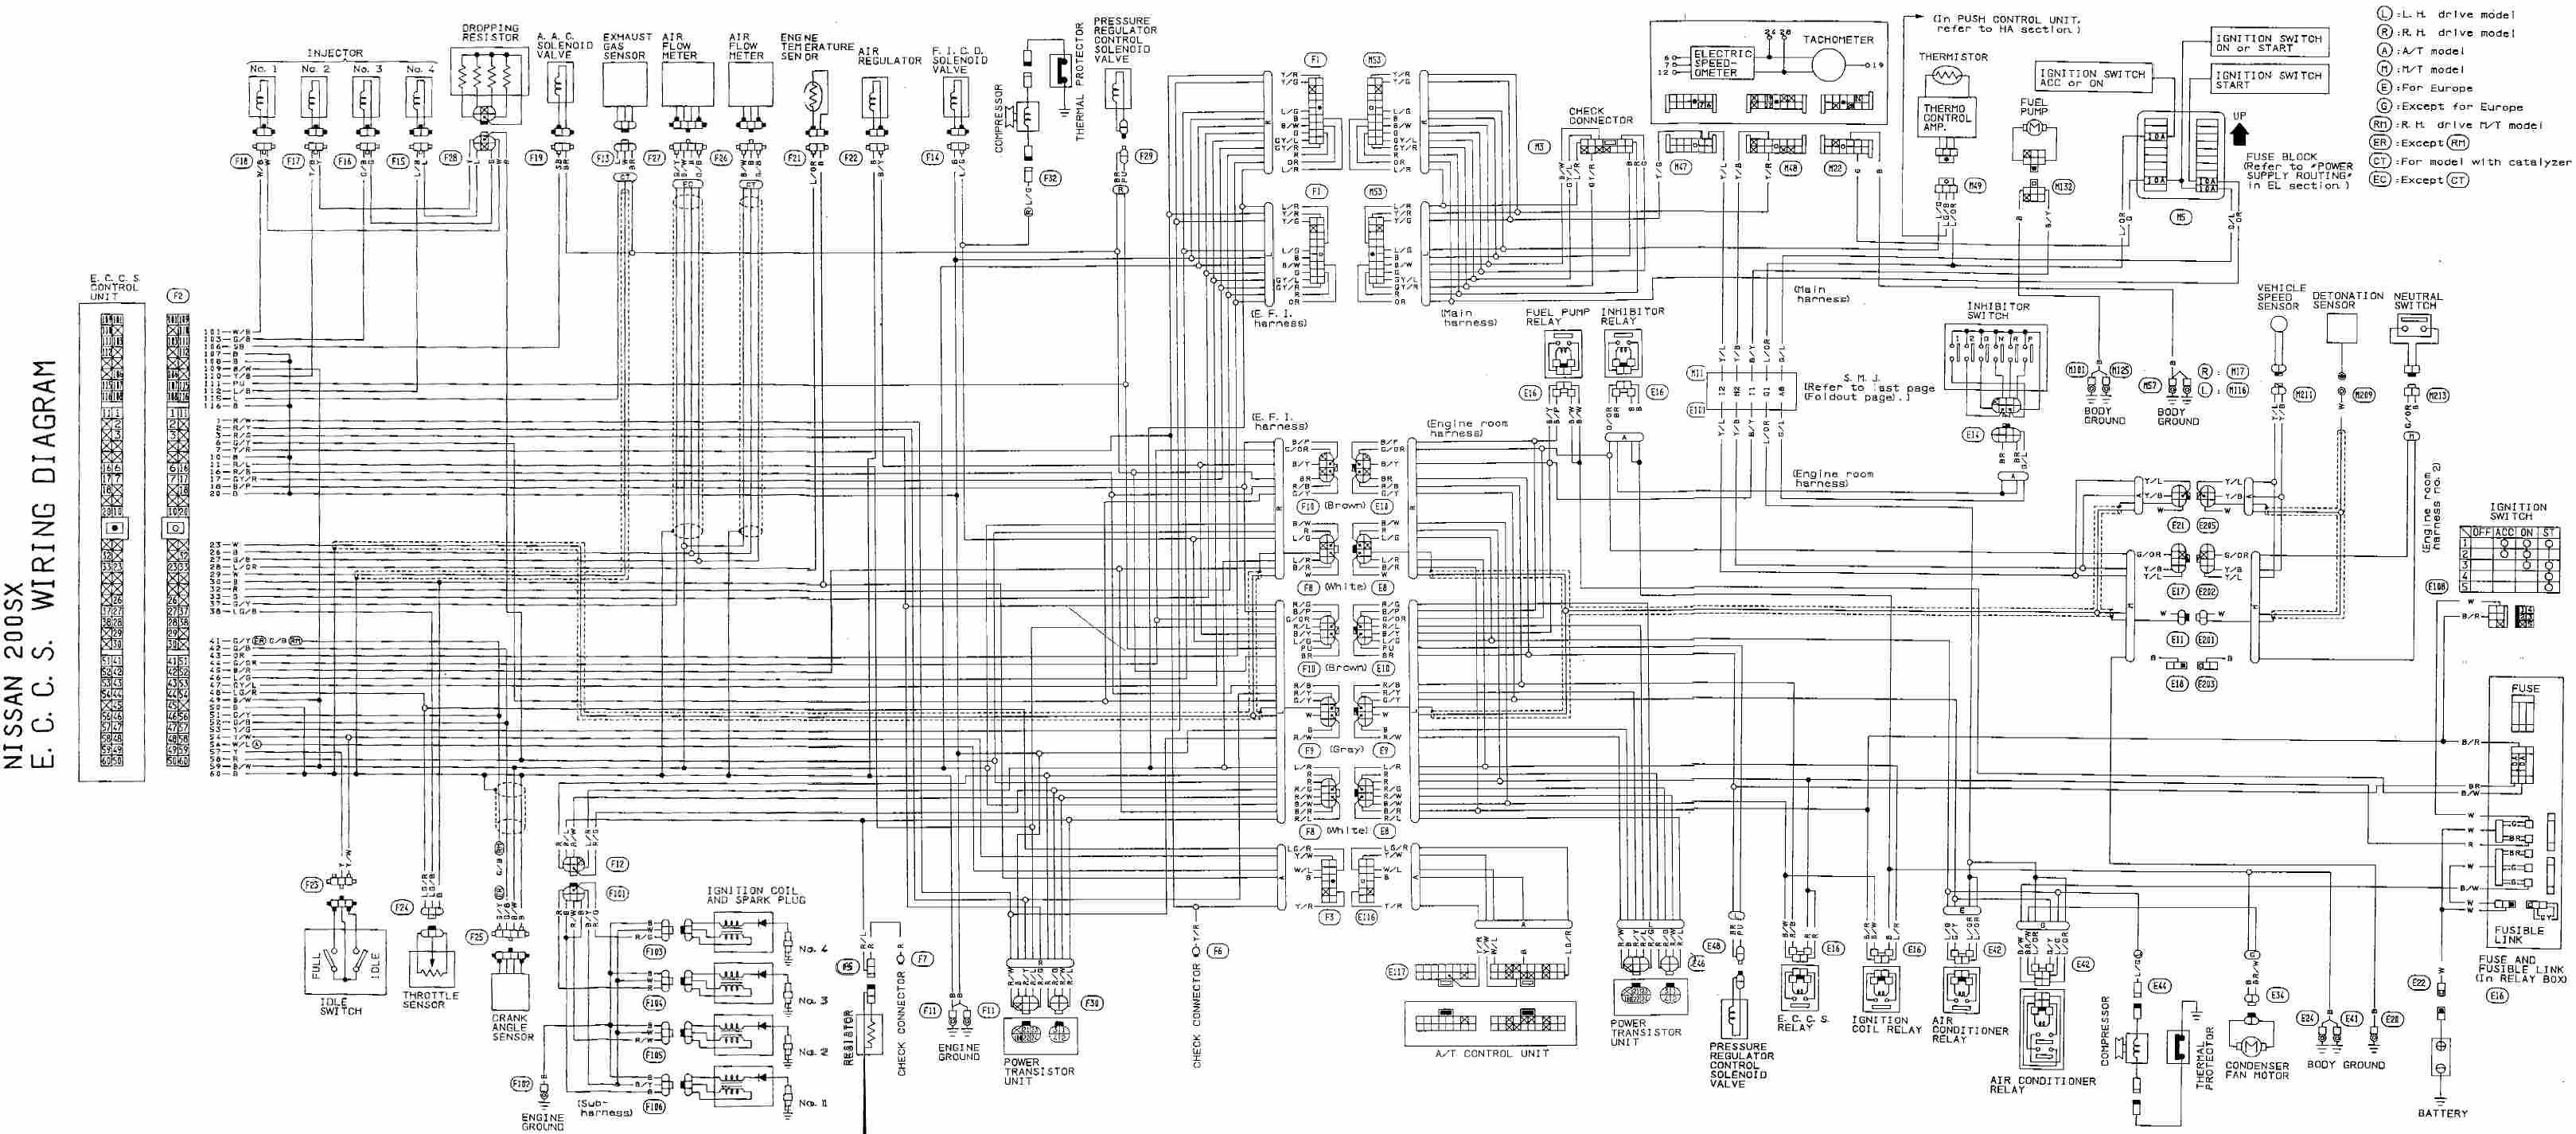 2001 nissan xterra radio diagram starting know about wiring diagram u2022 2002 xterra wiring diagram 2001 nissan xterra car stereo wiring diagram [ 3237 x 1425 Pixel ]